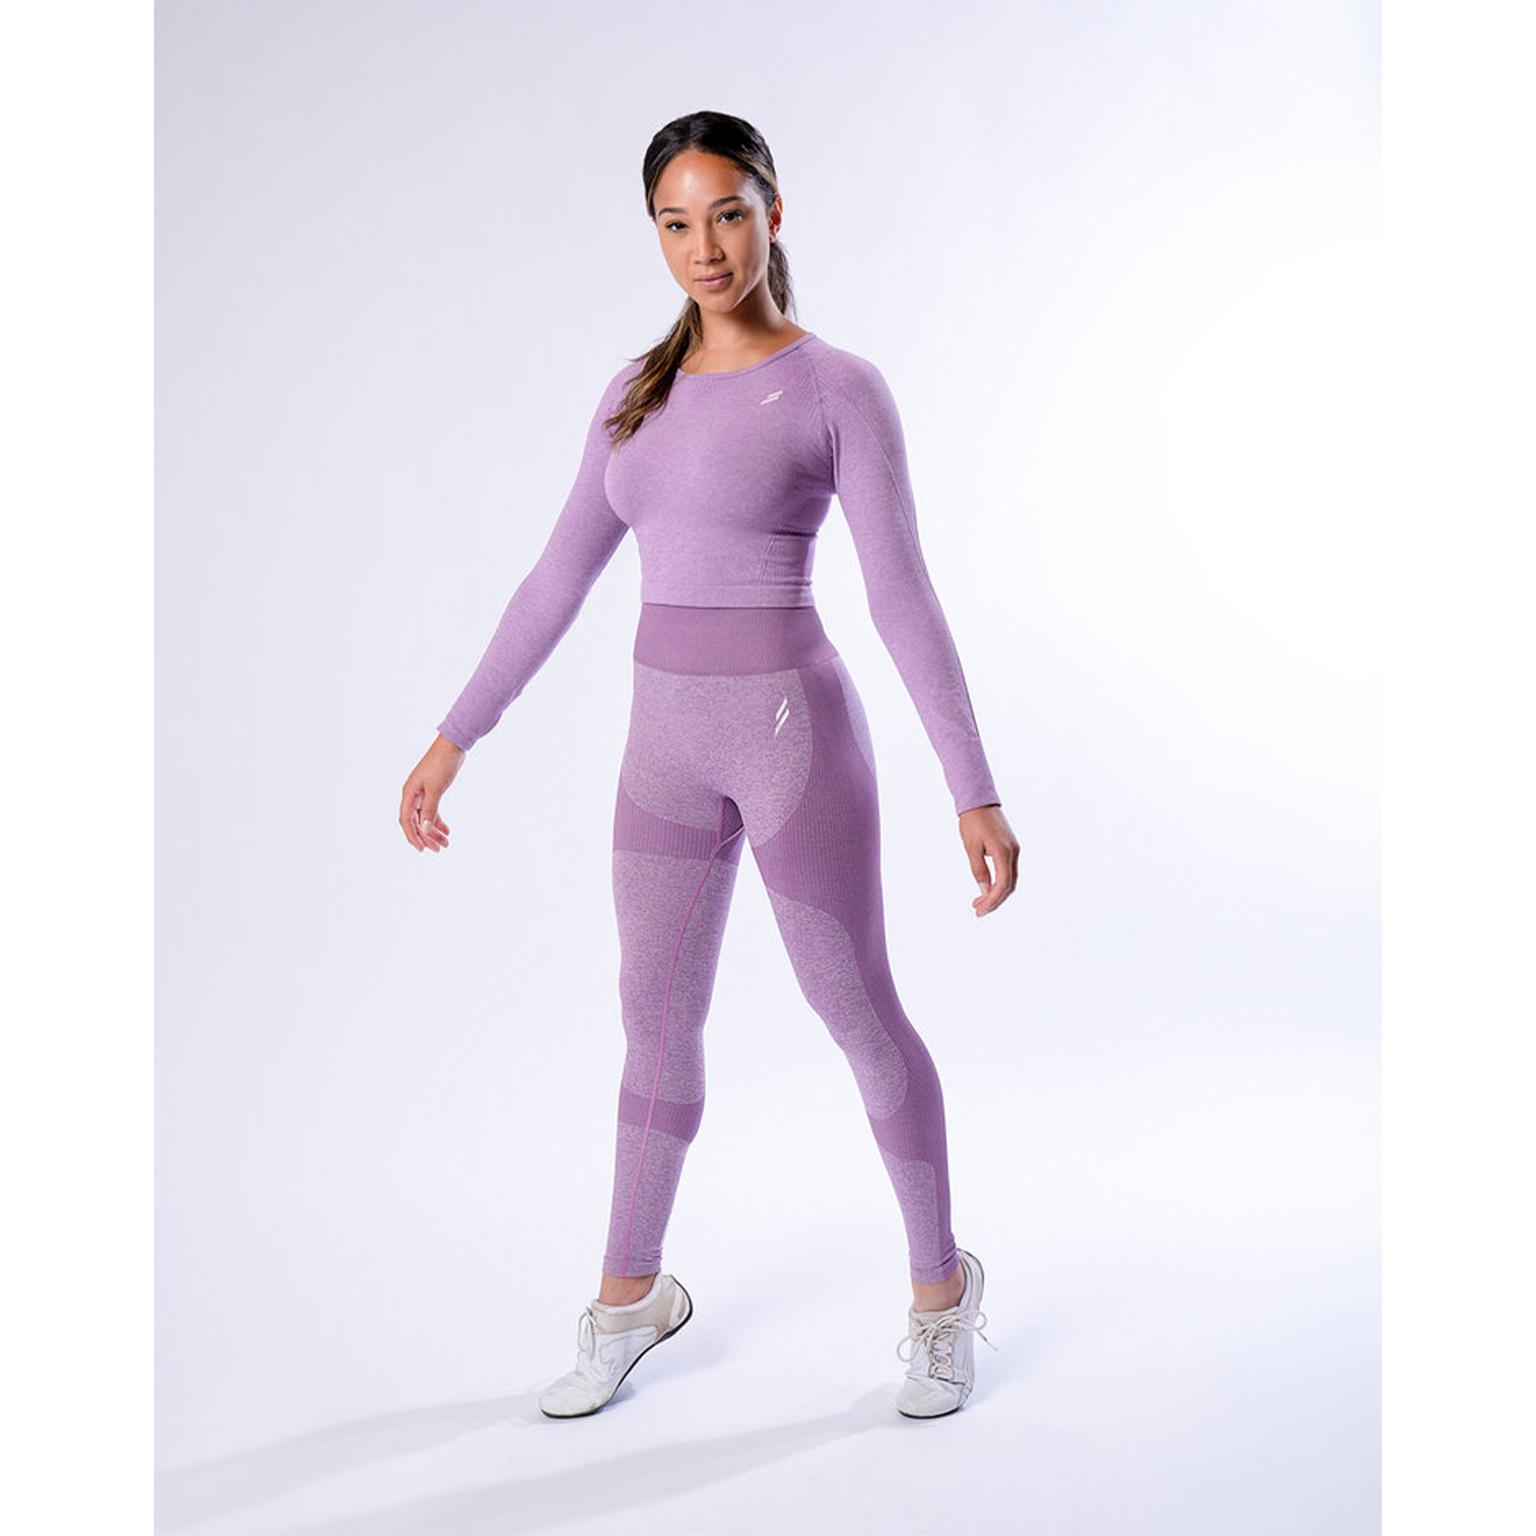 Toronto Fitness Model Agency - Lifestyle Commercial Model - Alysia Thomasos 1